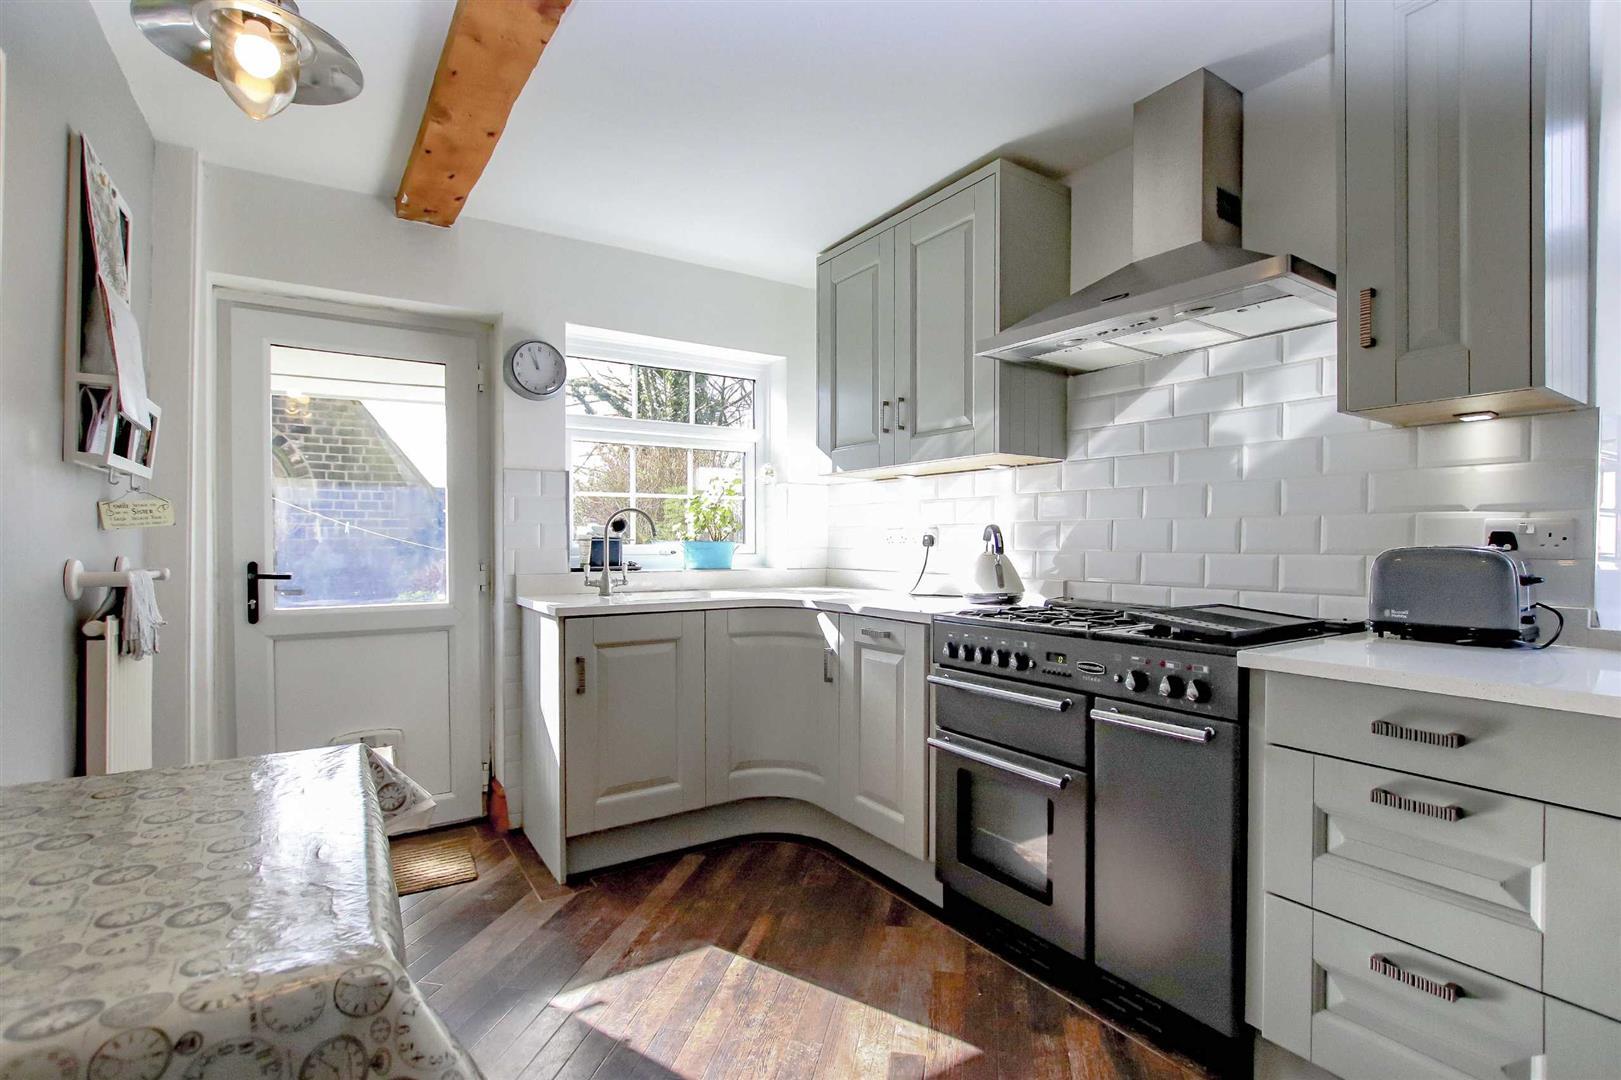 4 Bedroom Detached House For Sale - p033686_03.jpg